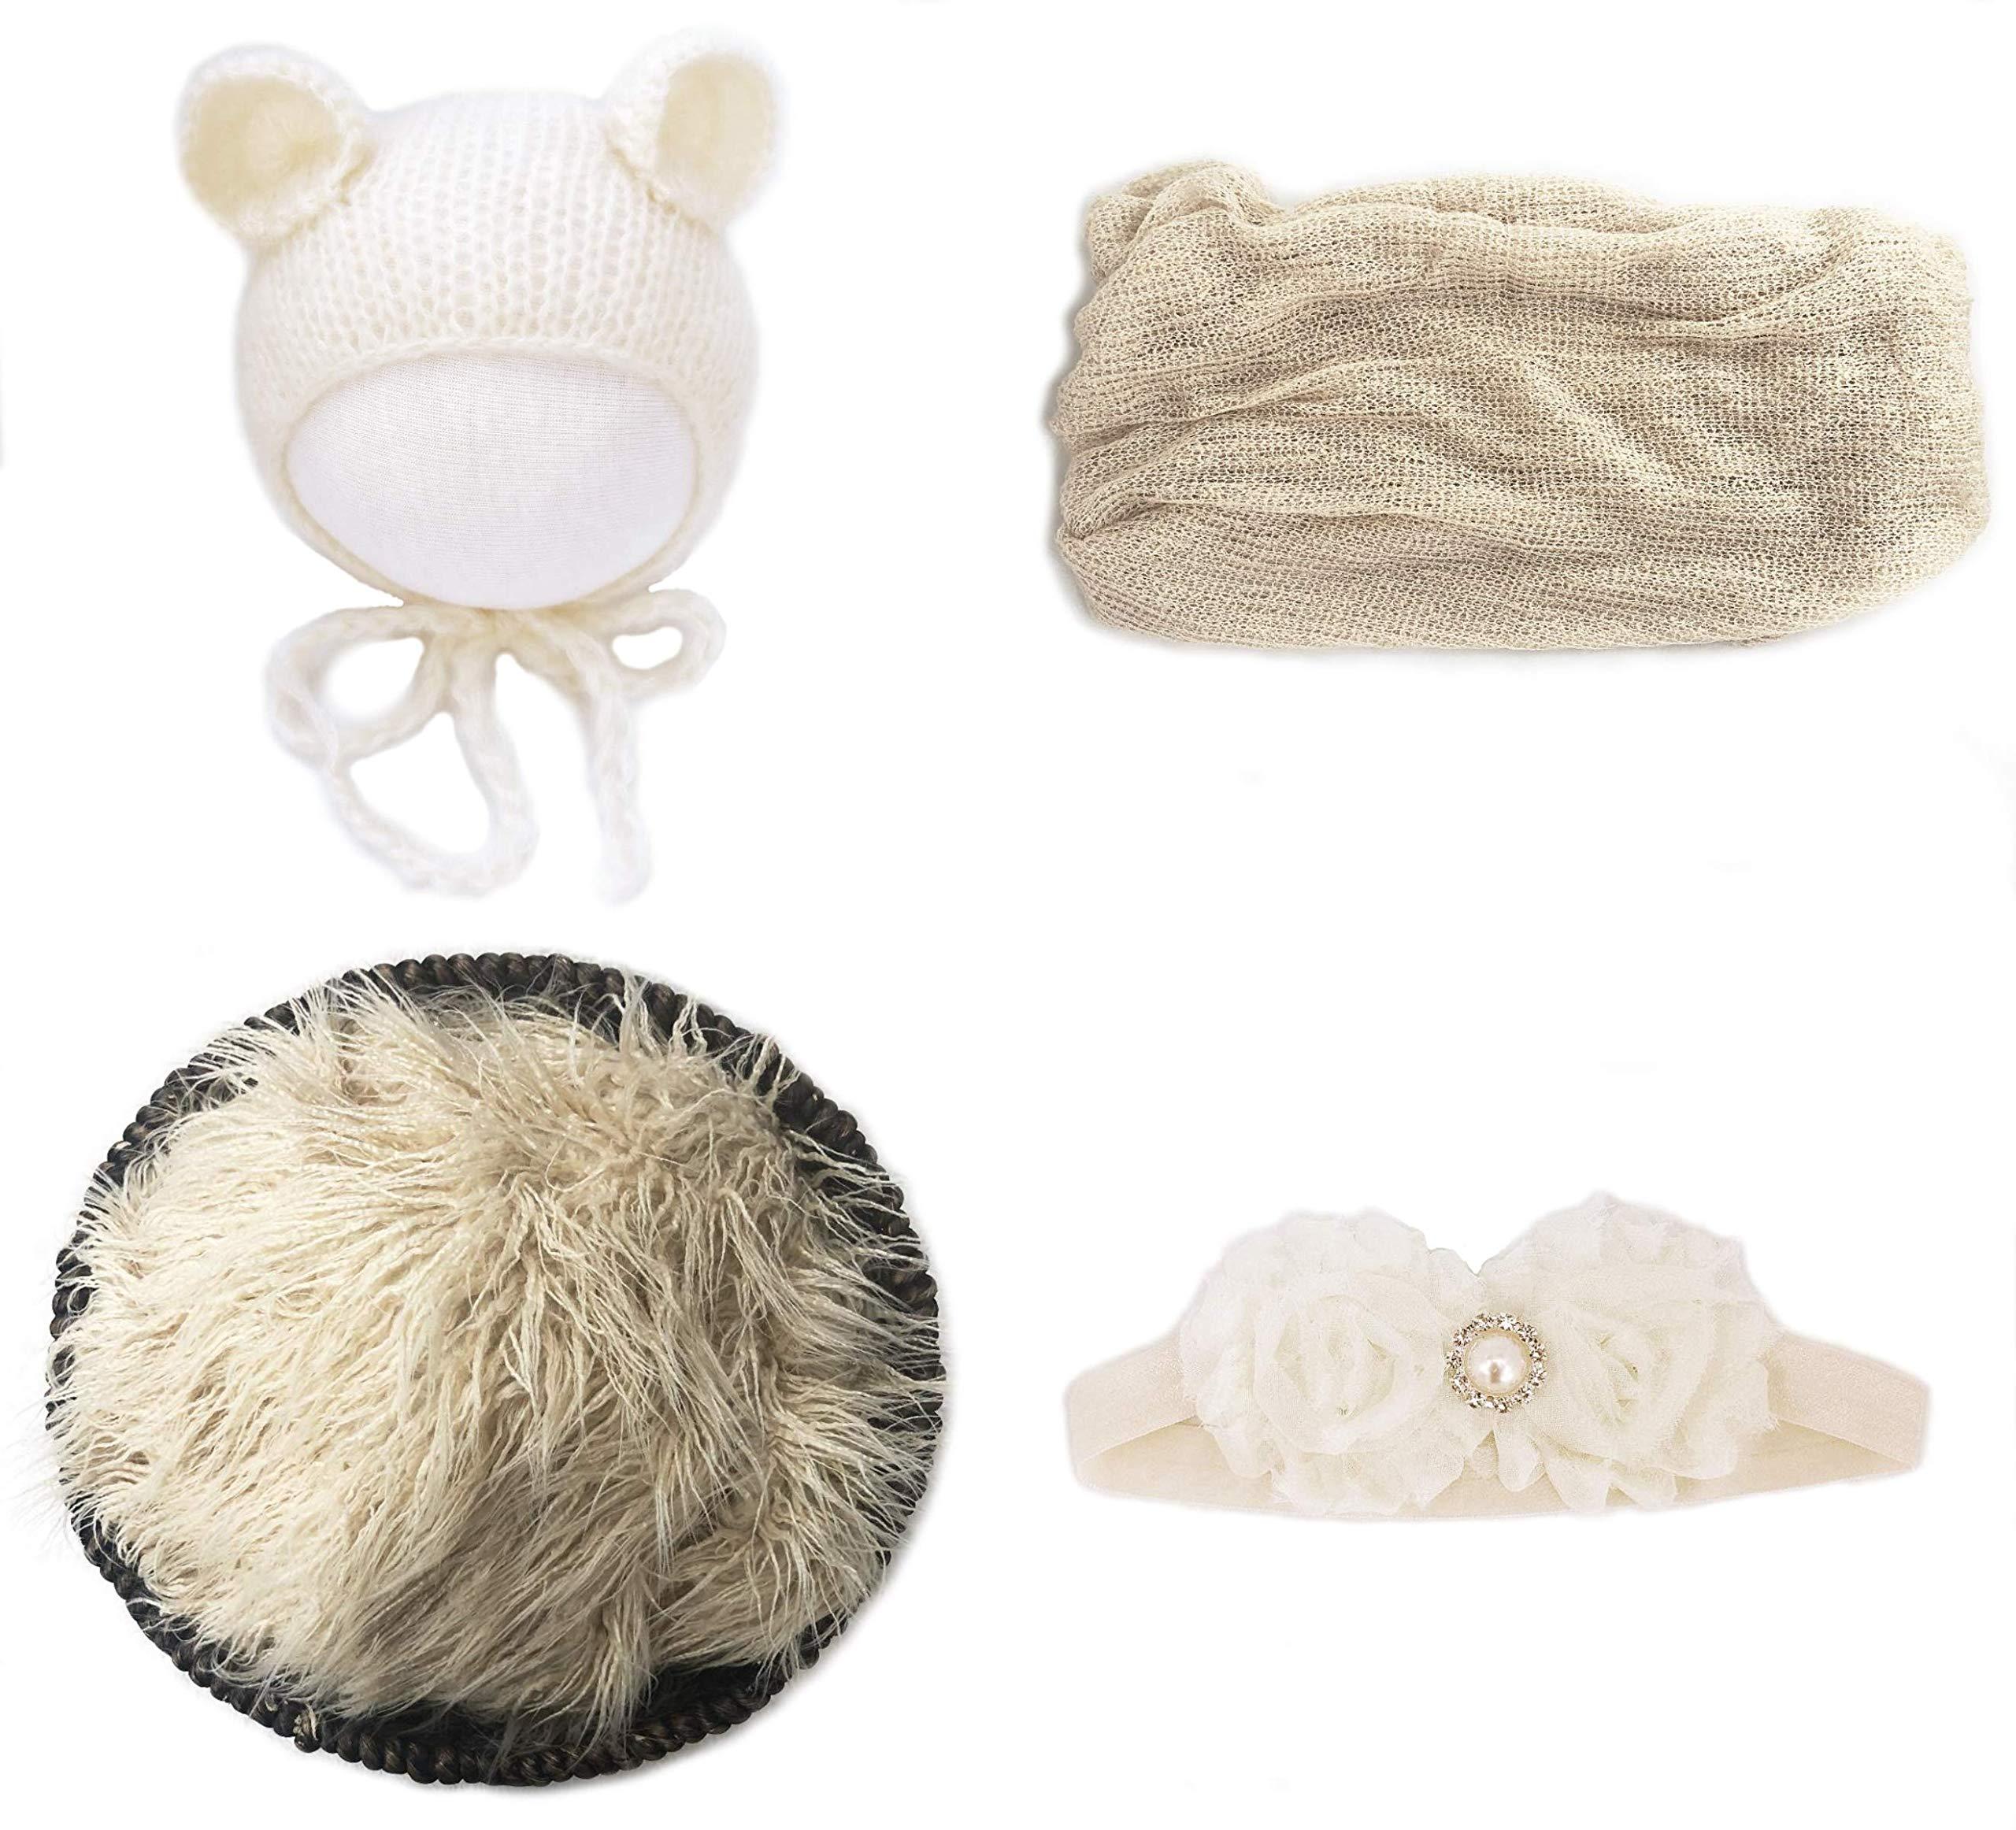 Jay-EE Newborn 4 Pcs Photography Props Set Baby Photo Prop Long Ripple Stretch Wrap, Headband, Ears Hat and Faux Fur Backdrop Blanket (Beige)